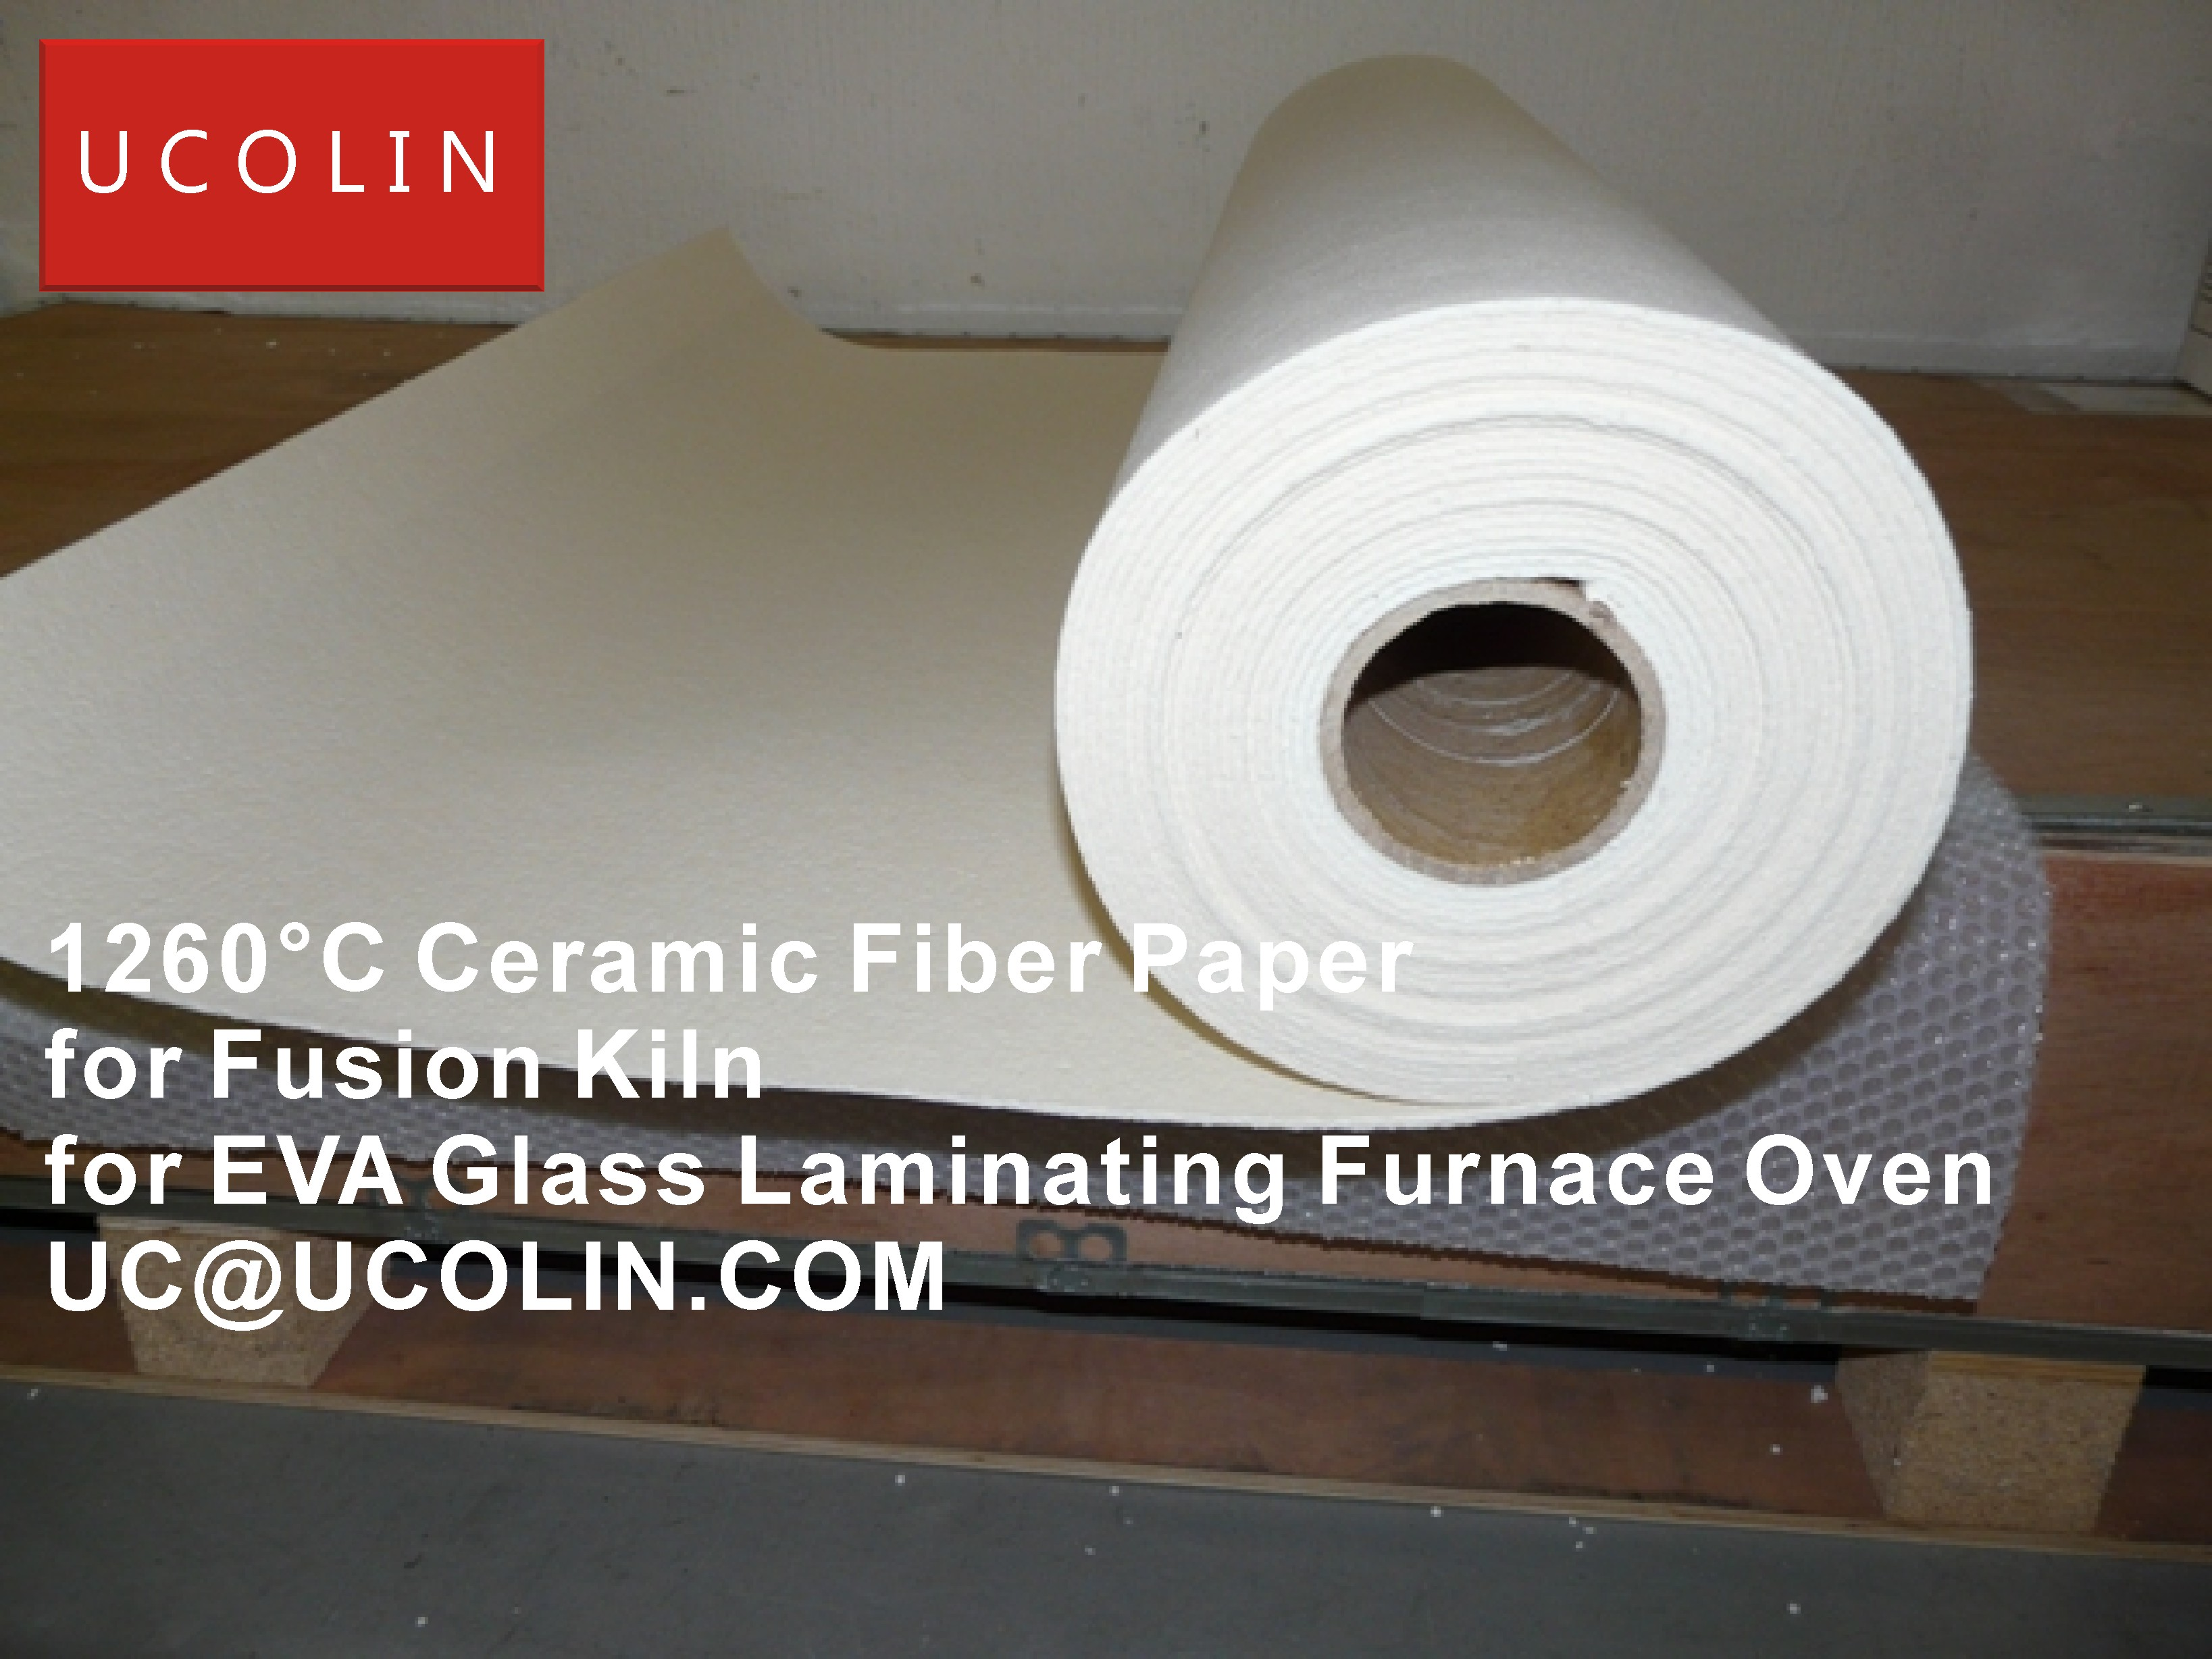 02-1260°C Ceramic Fiber Paper for Fusion Kiln